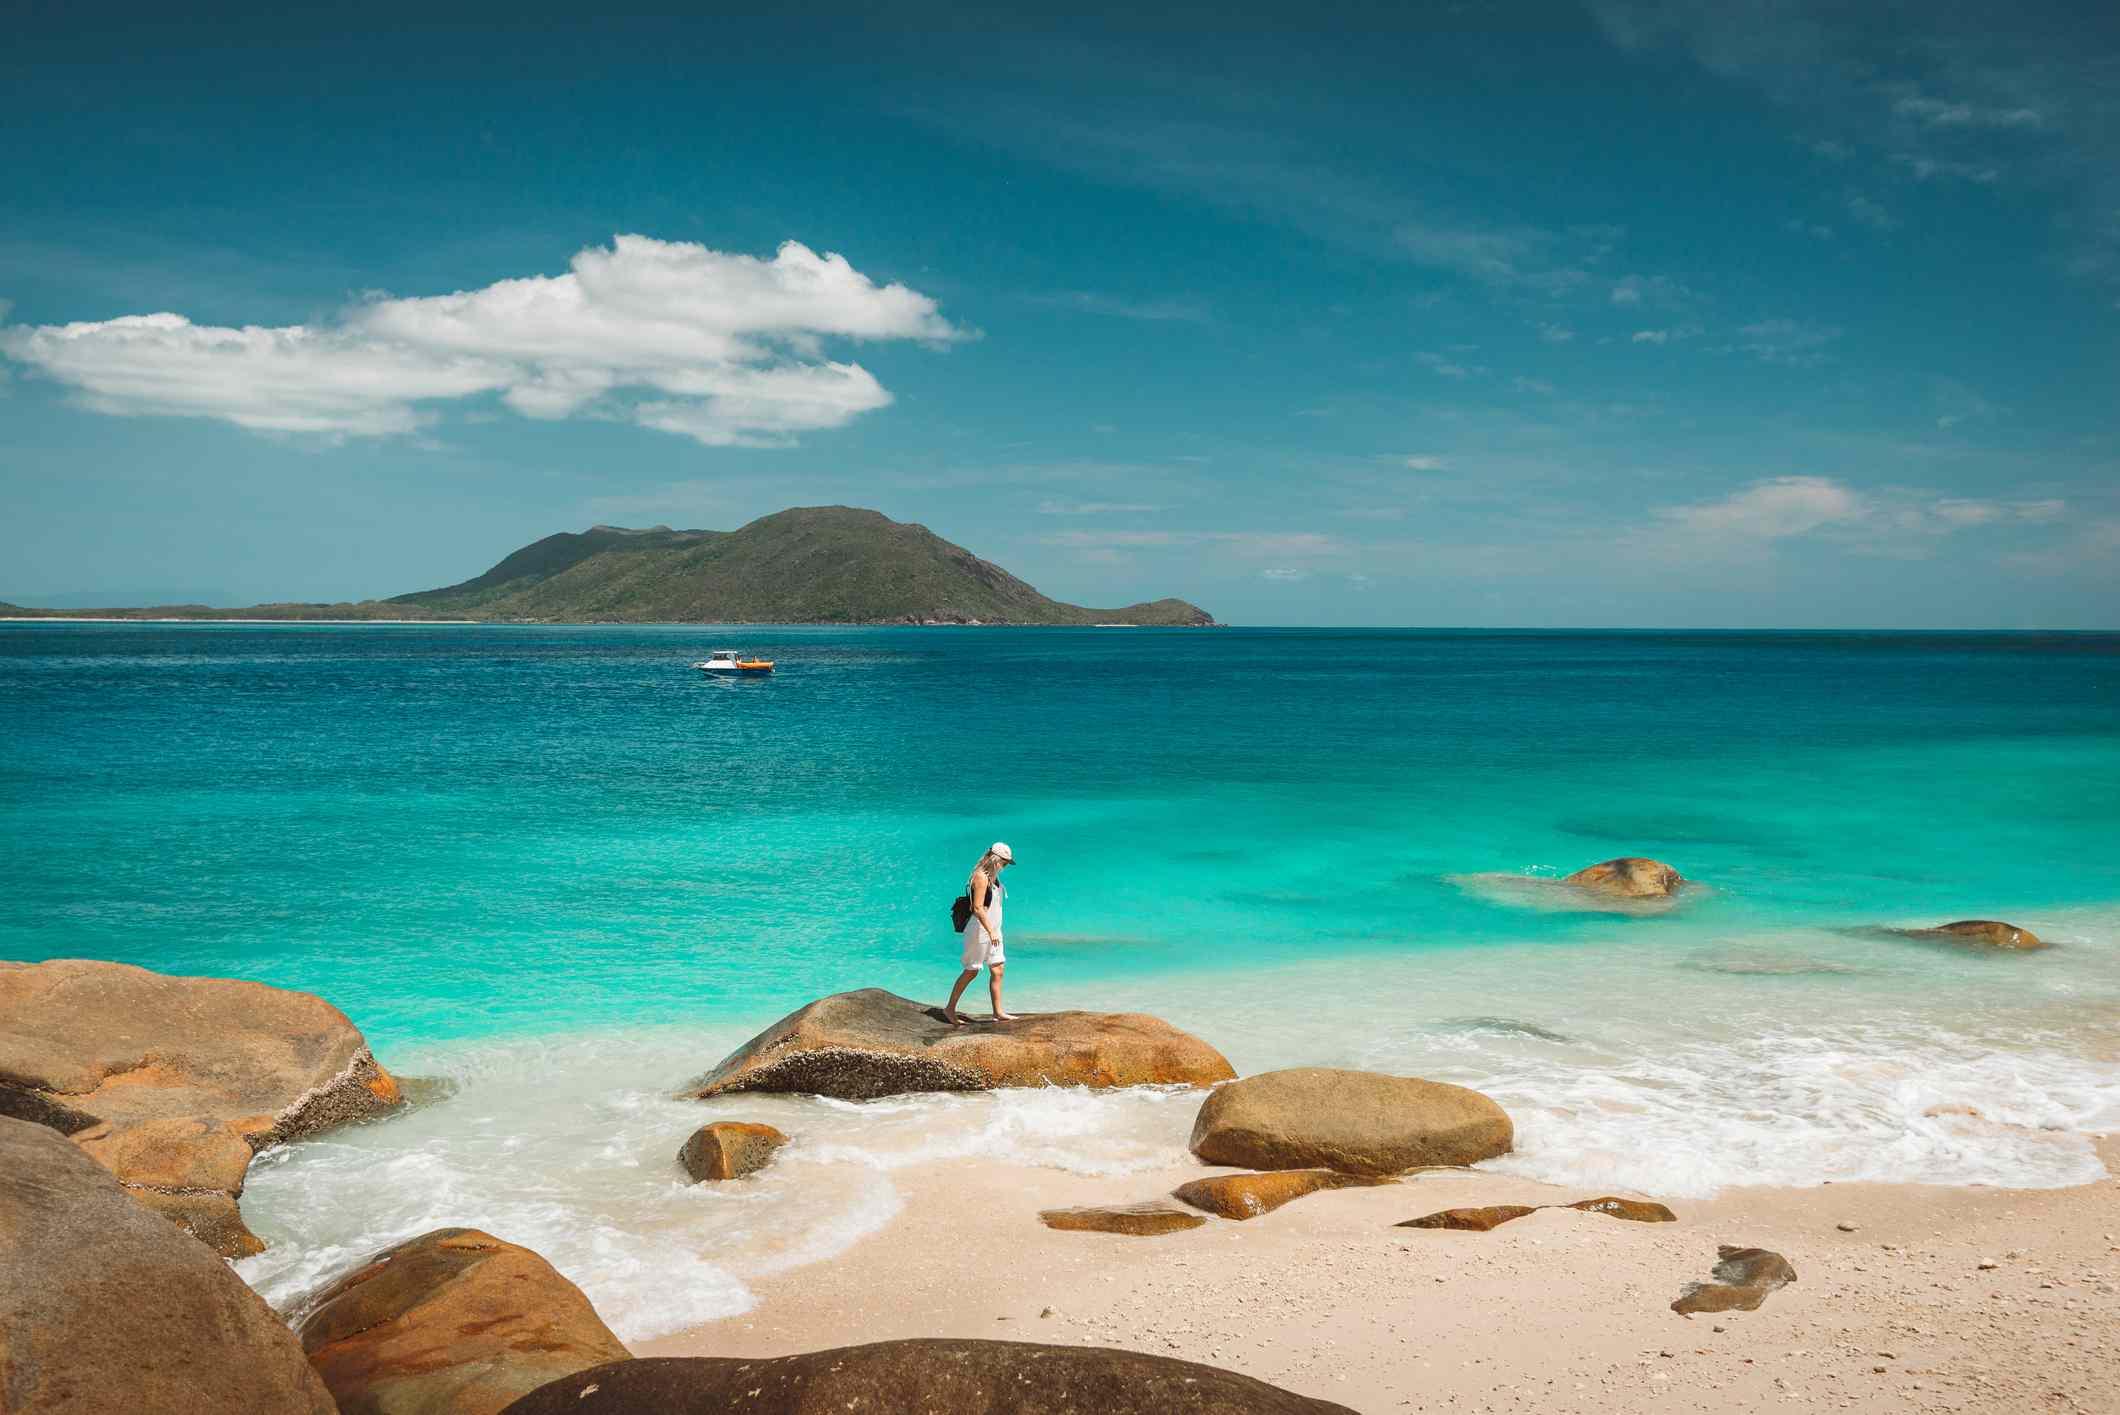 Nudey beach backpackers